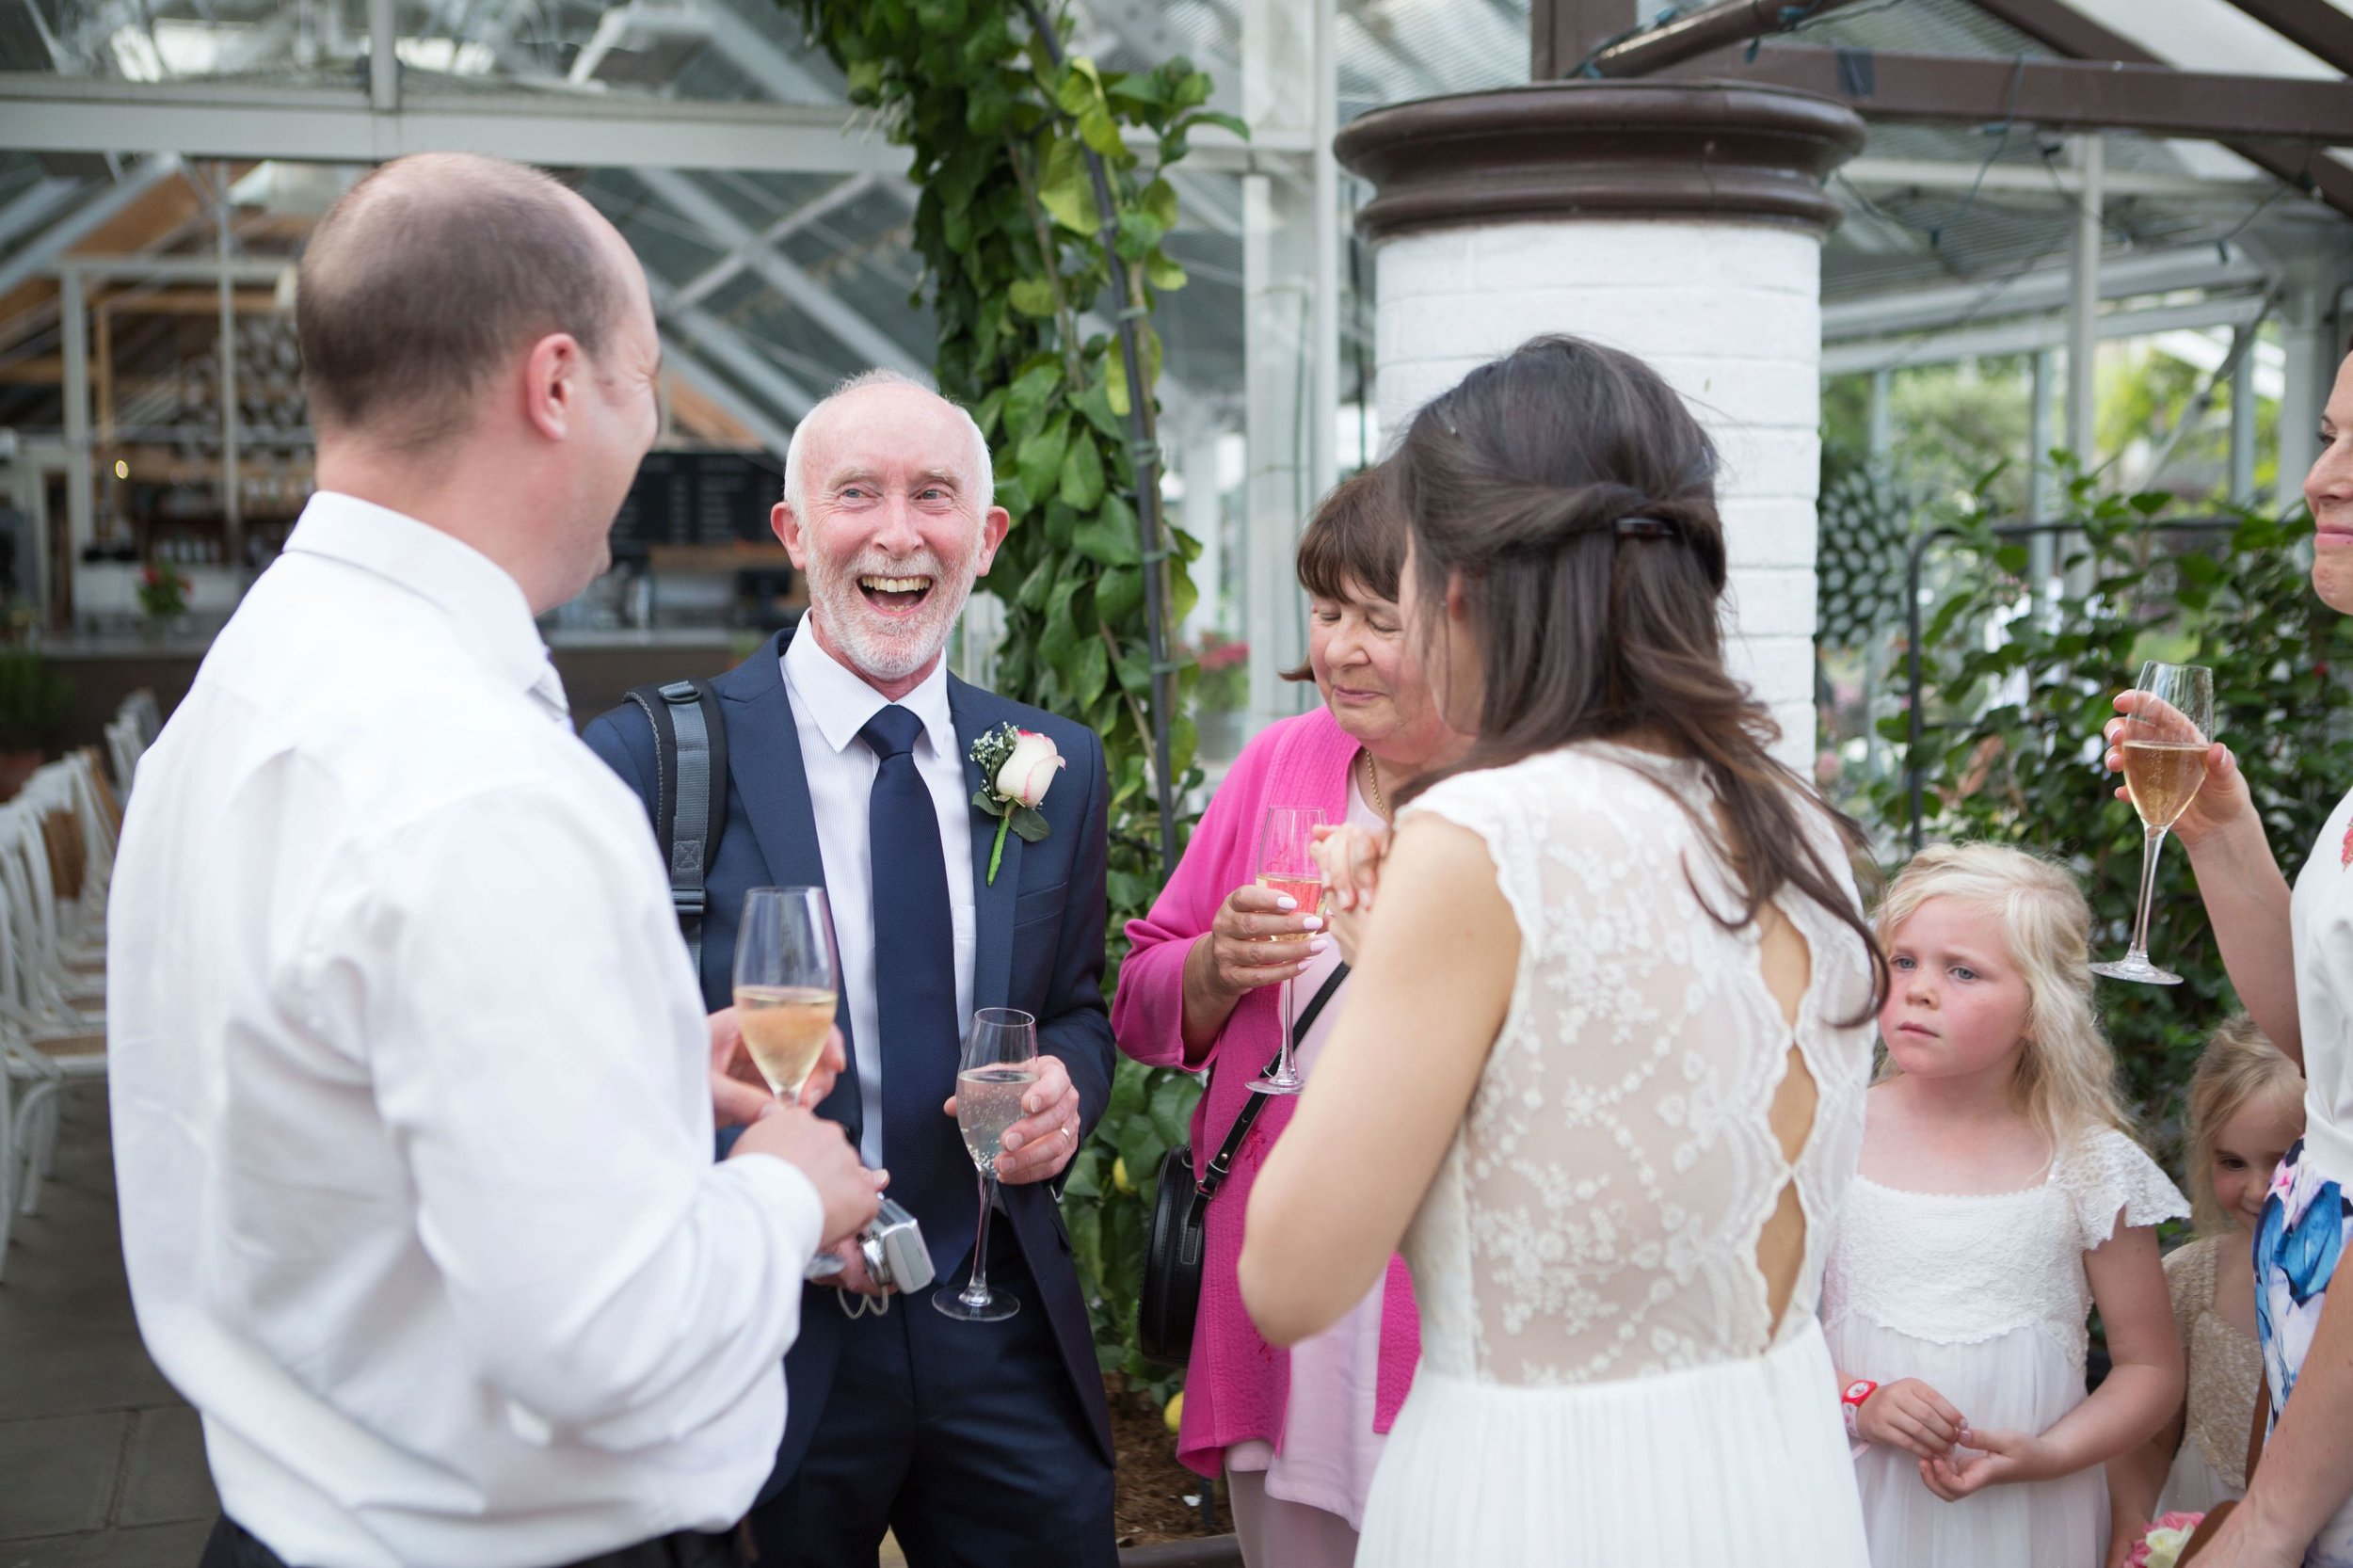 Hulya_&_Ben's_Clifton_Nurseries_London_Wedding_0437.jpg